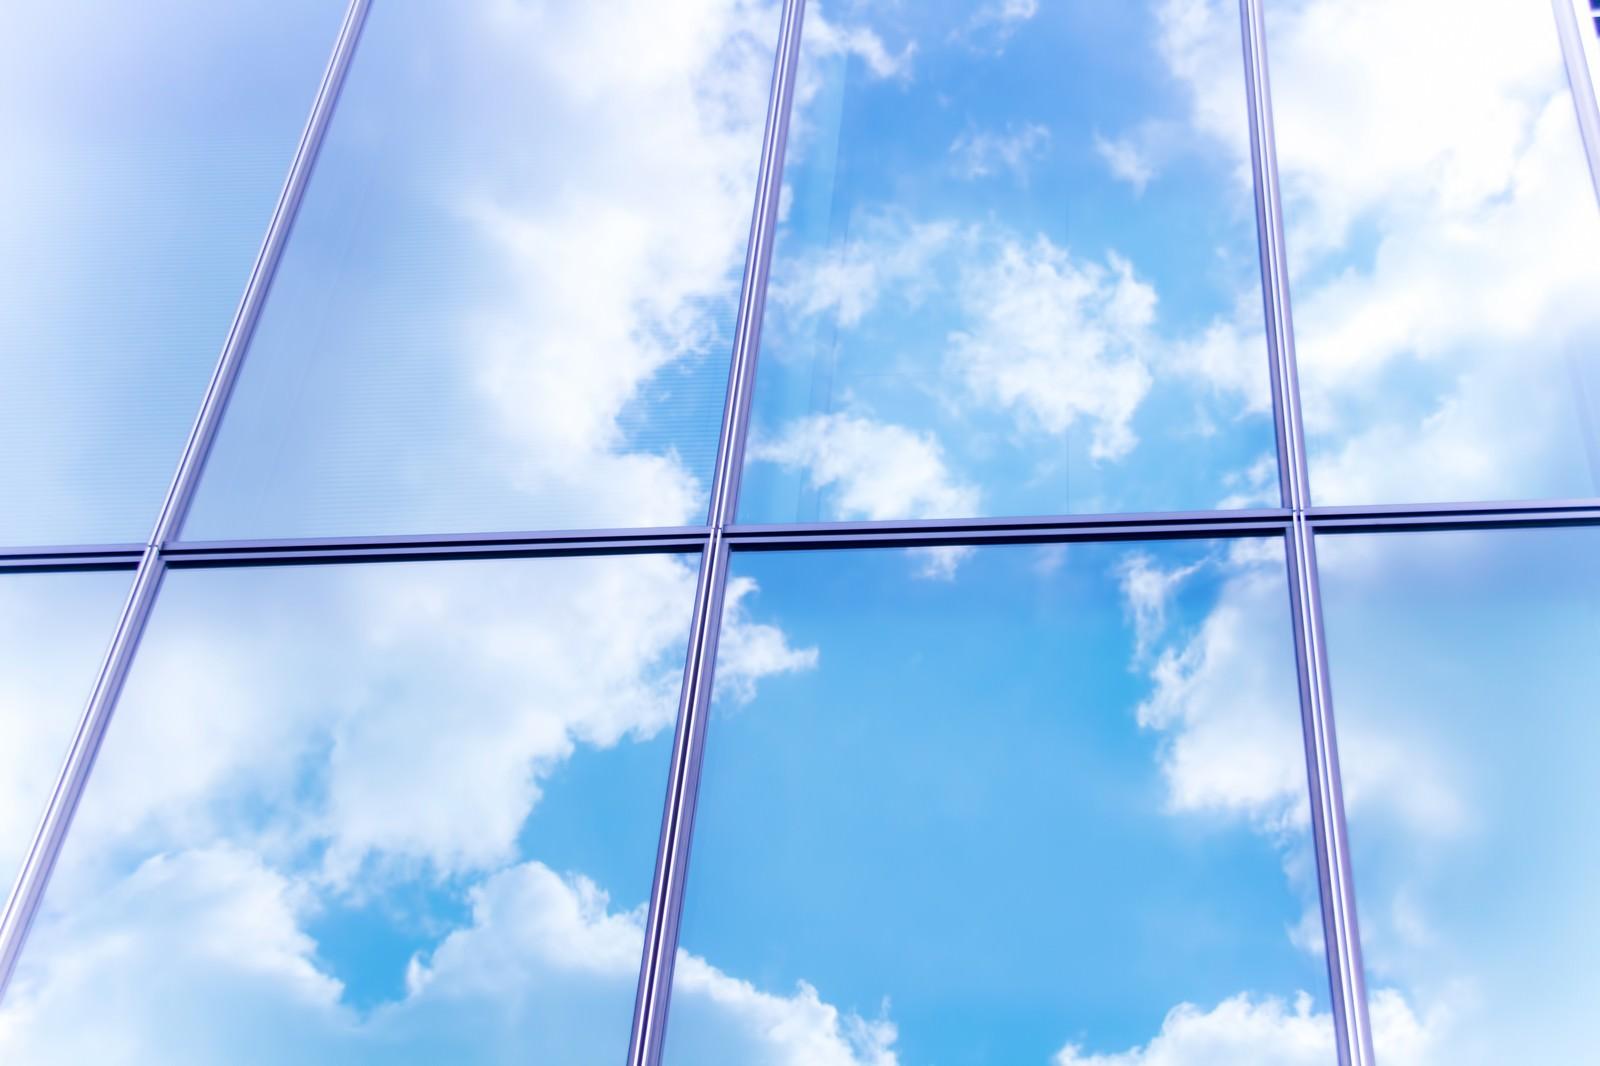 Beautiful-Windows-Showing-the-Sky-Pakutaso.jpg